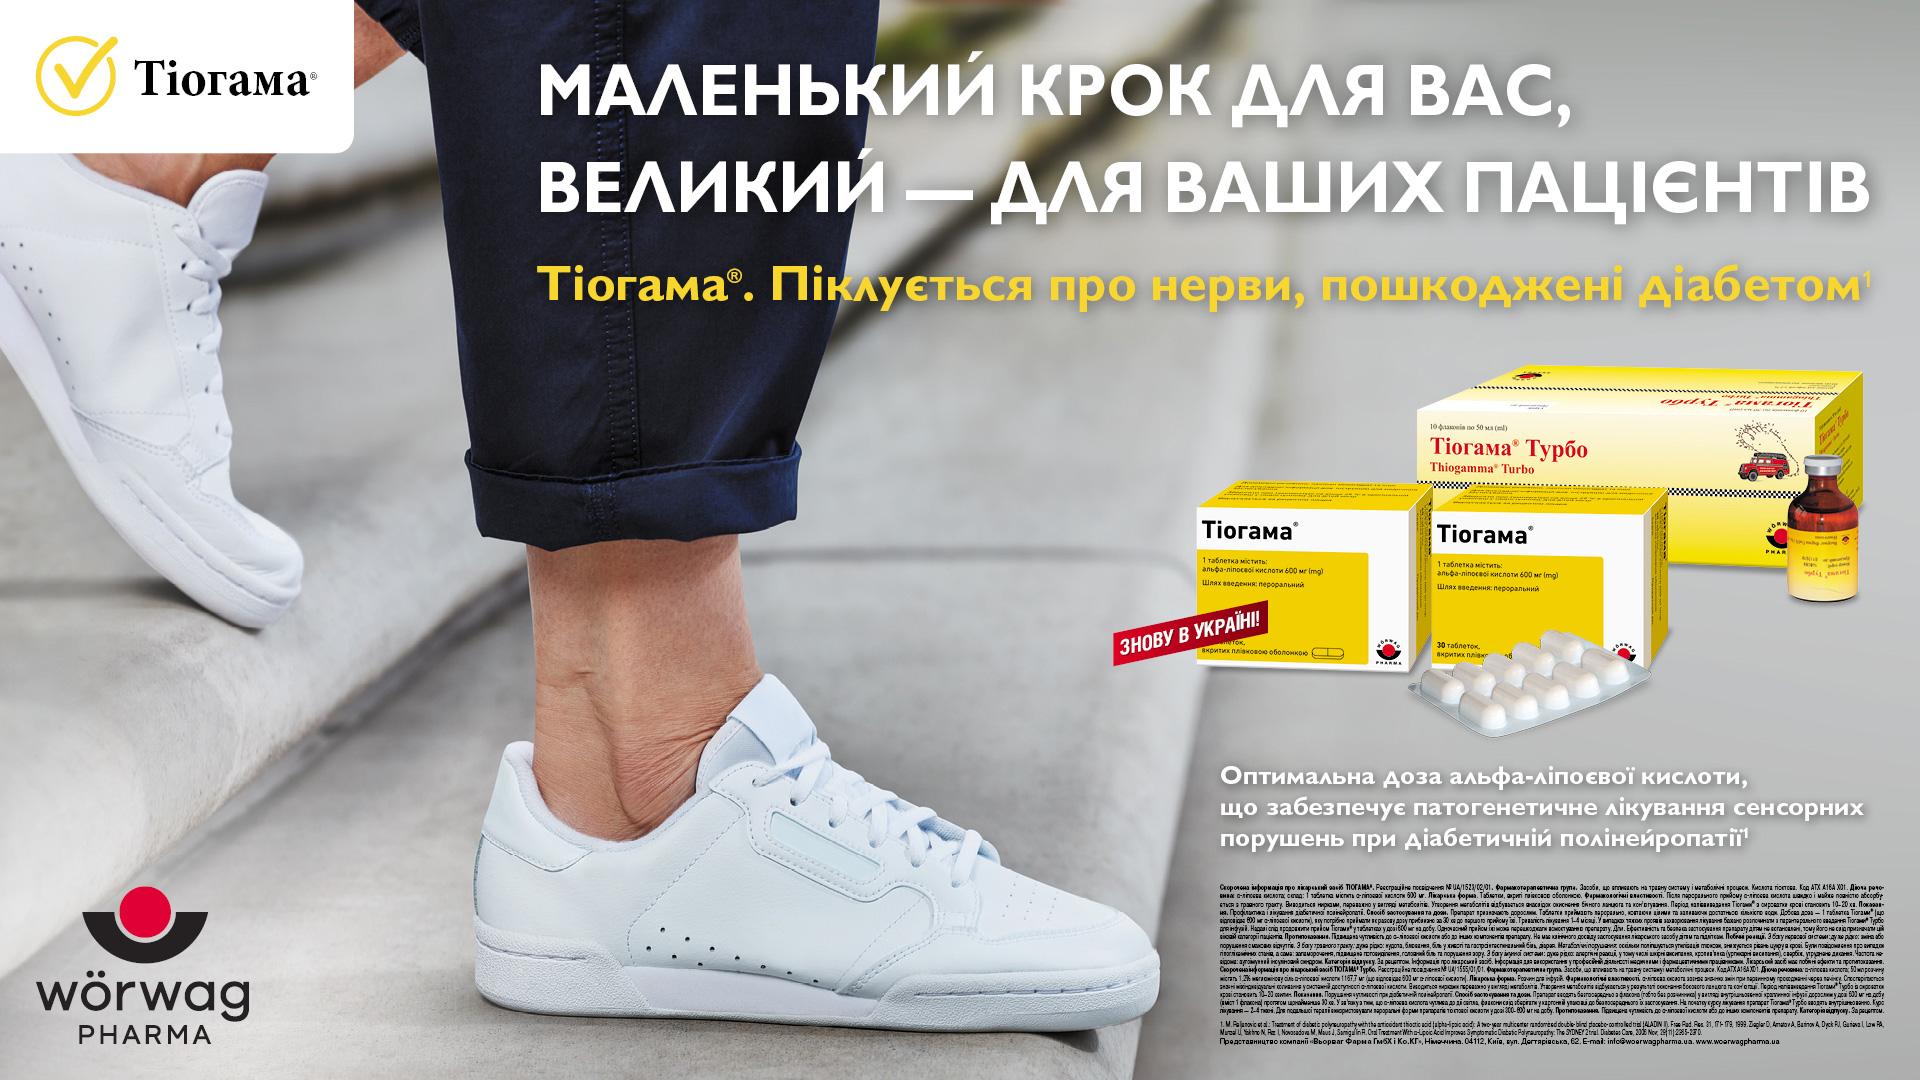 210929-02_Tiogamma_advertising_1920x1080_ukr_final